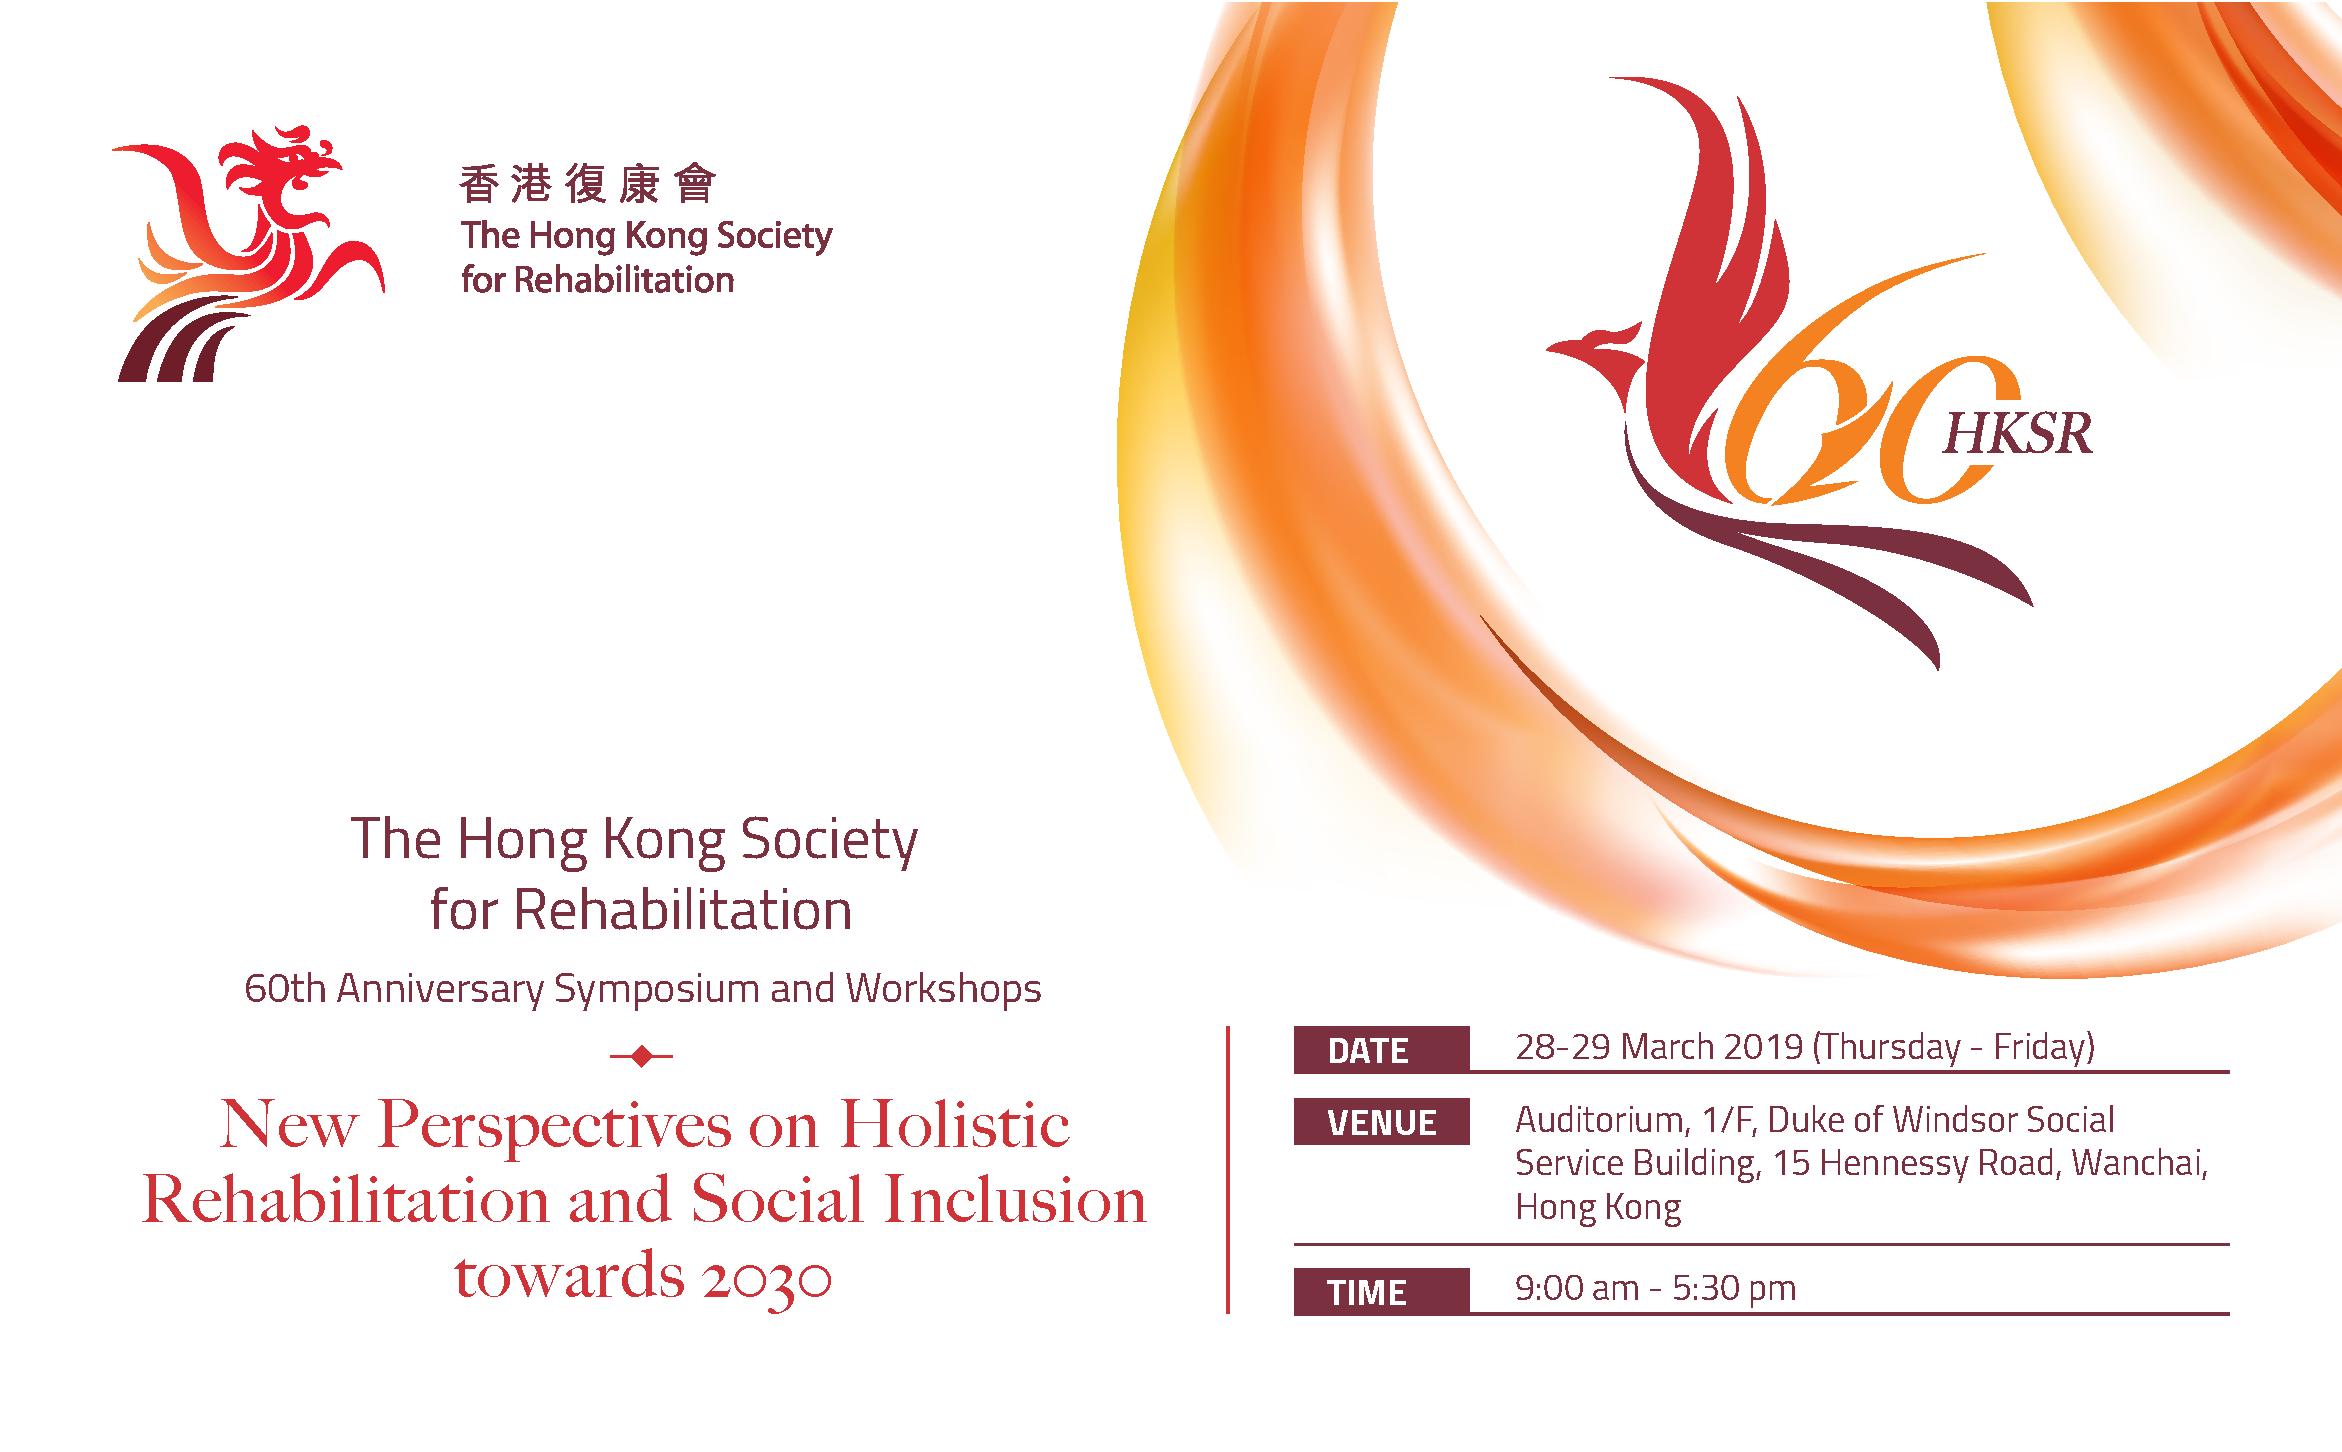 The Hong Kong Society for Rehabilitation | 60th Anniversary